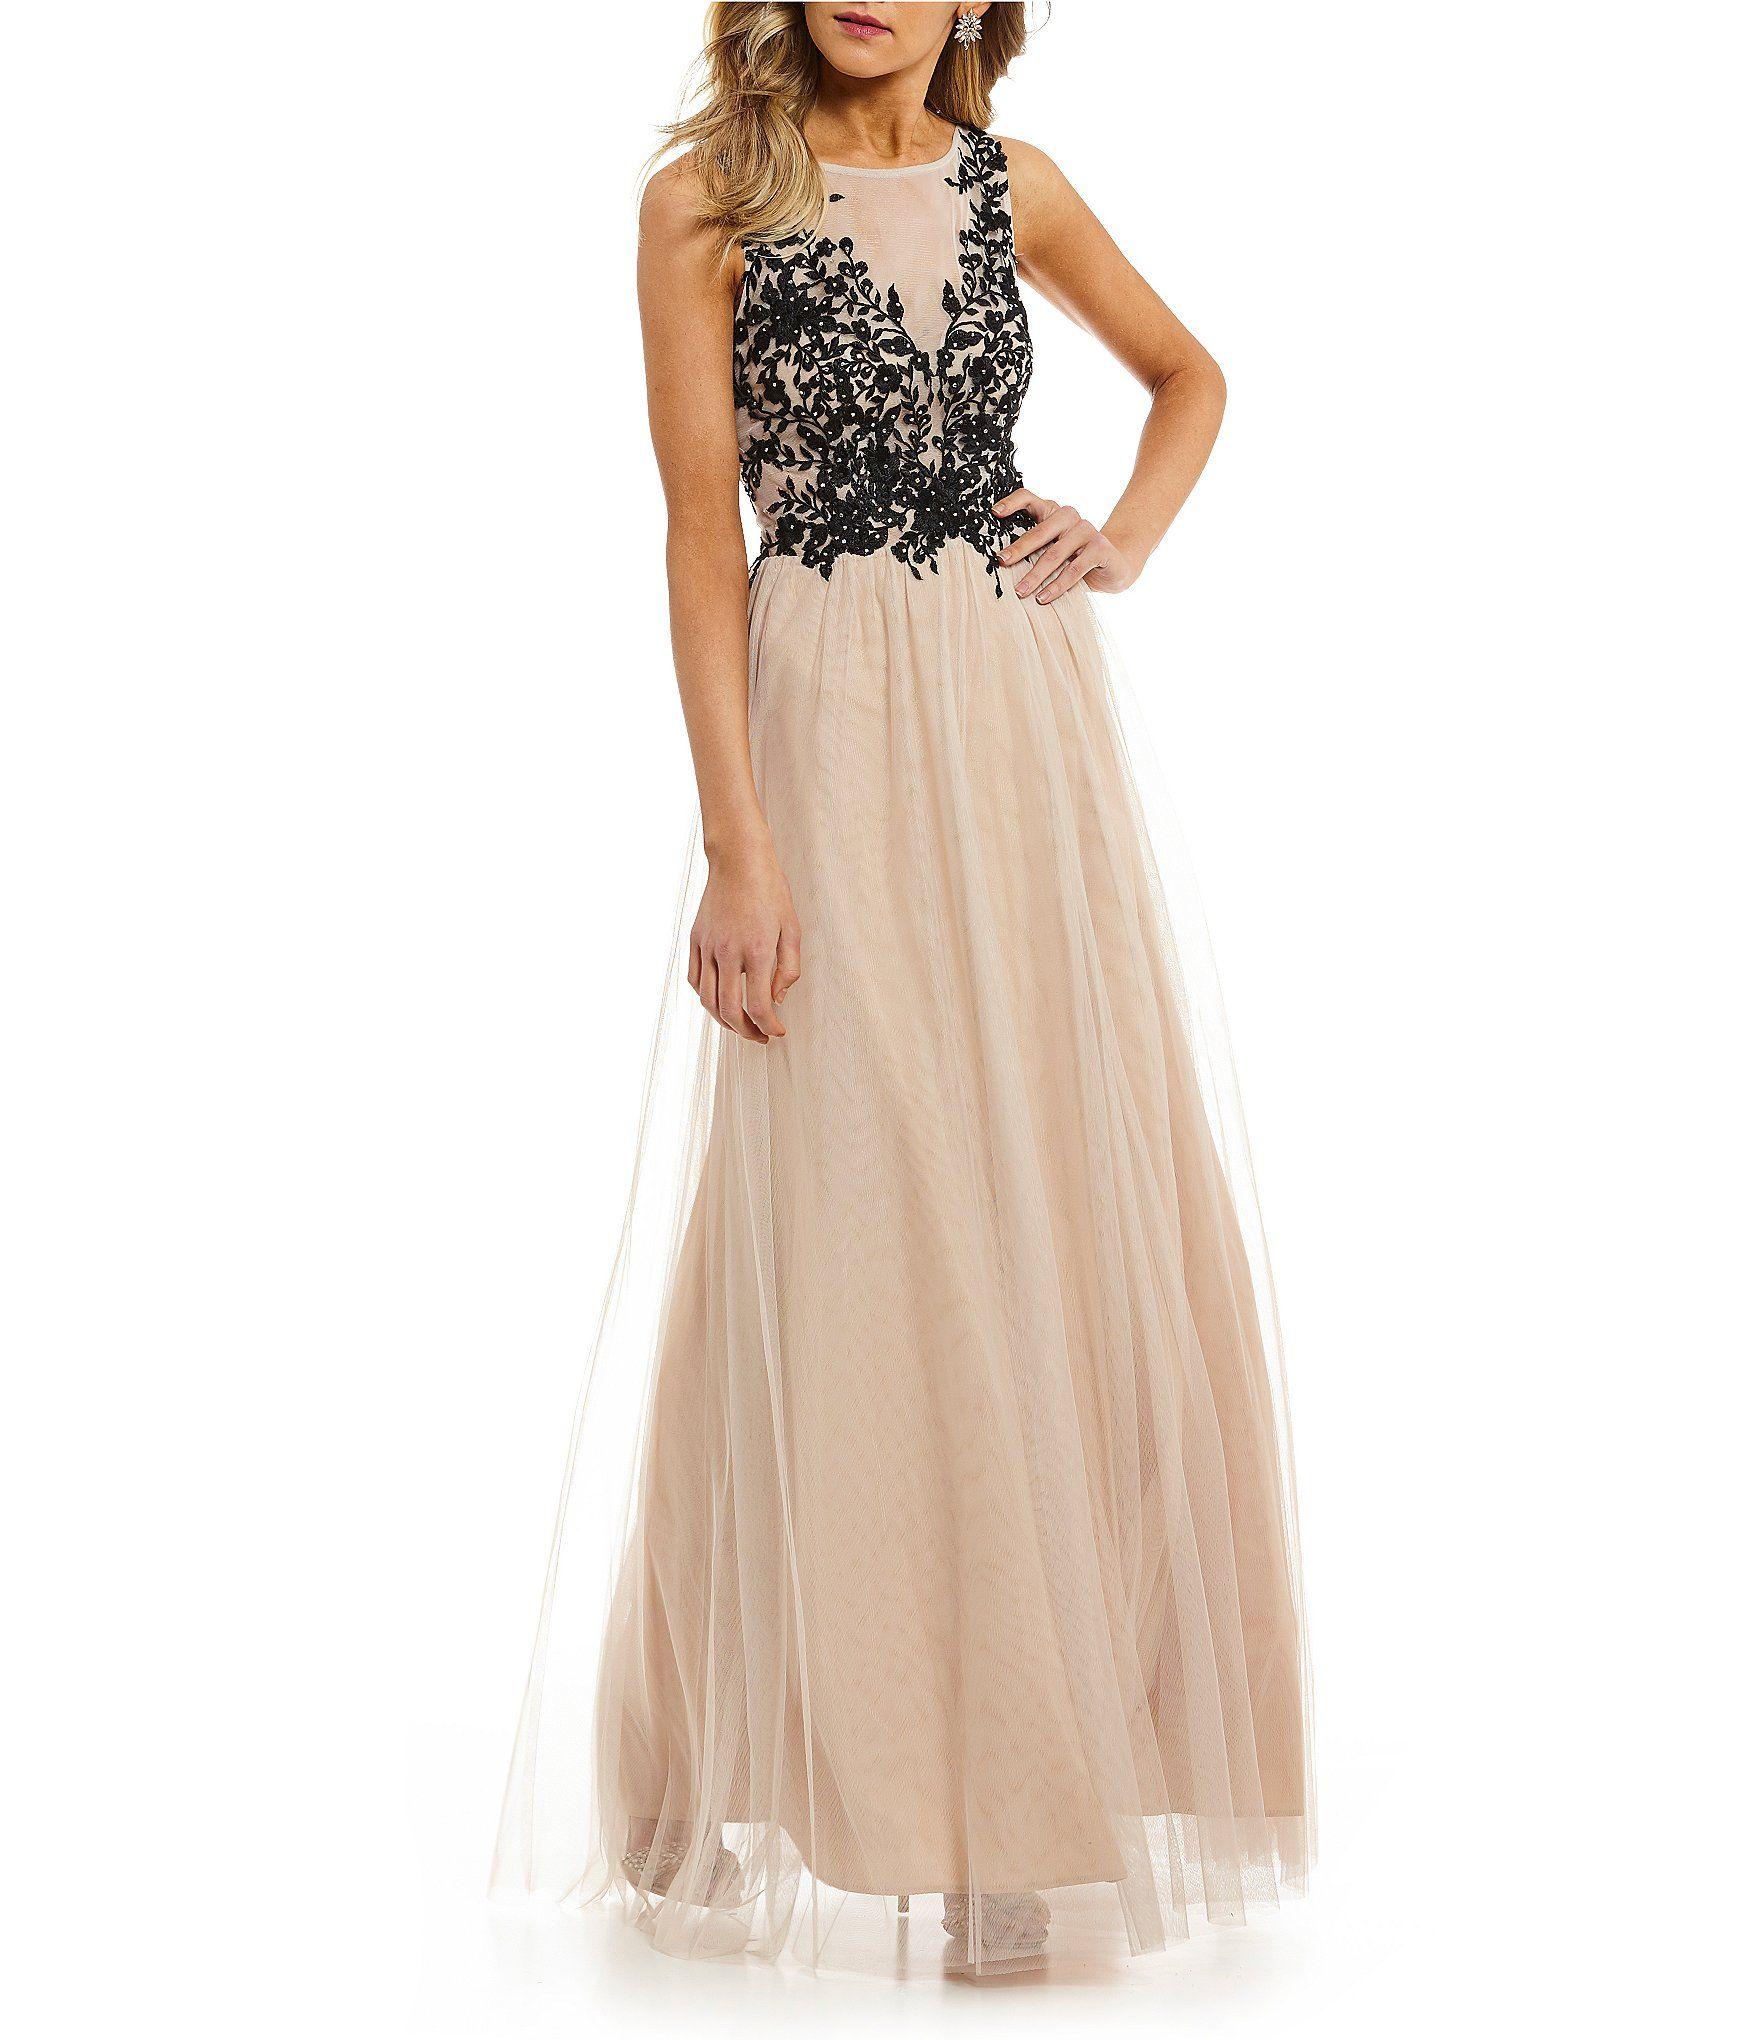 dillards formal dresses